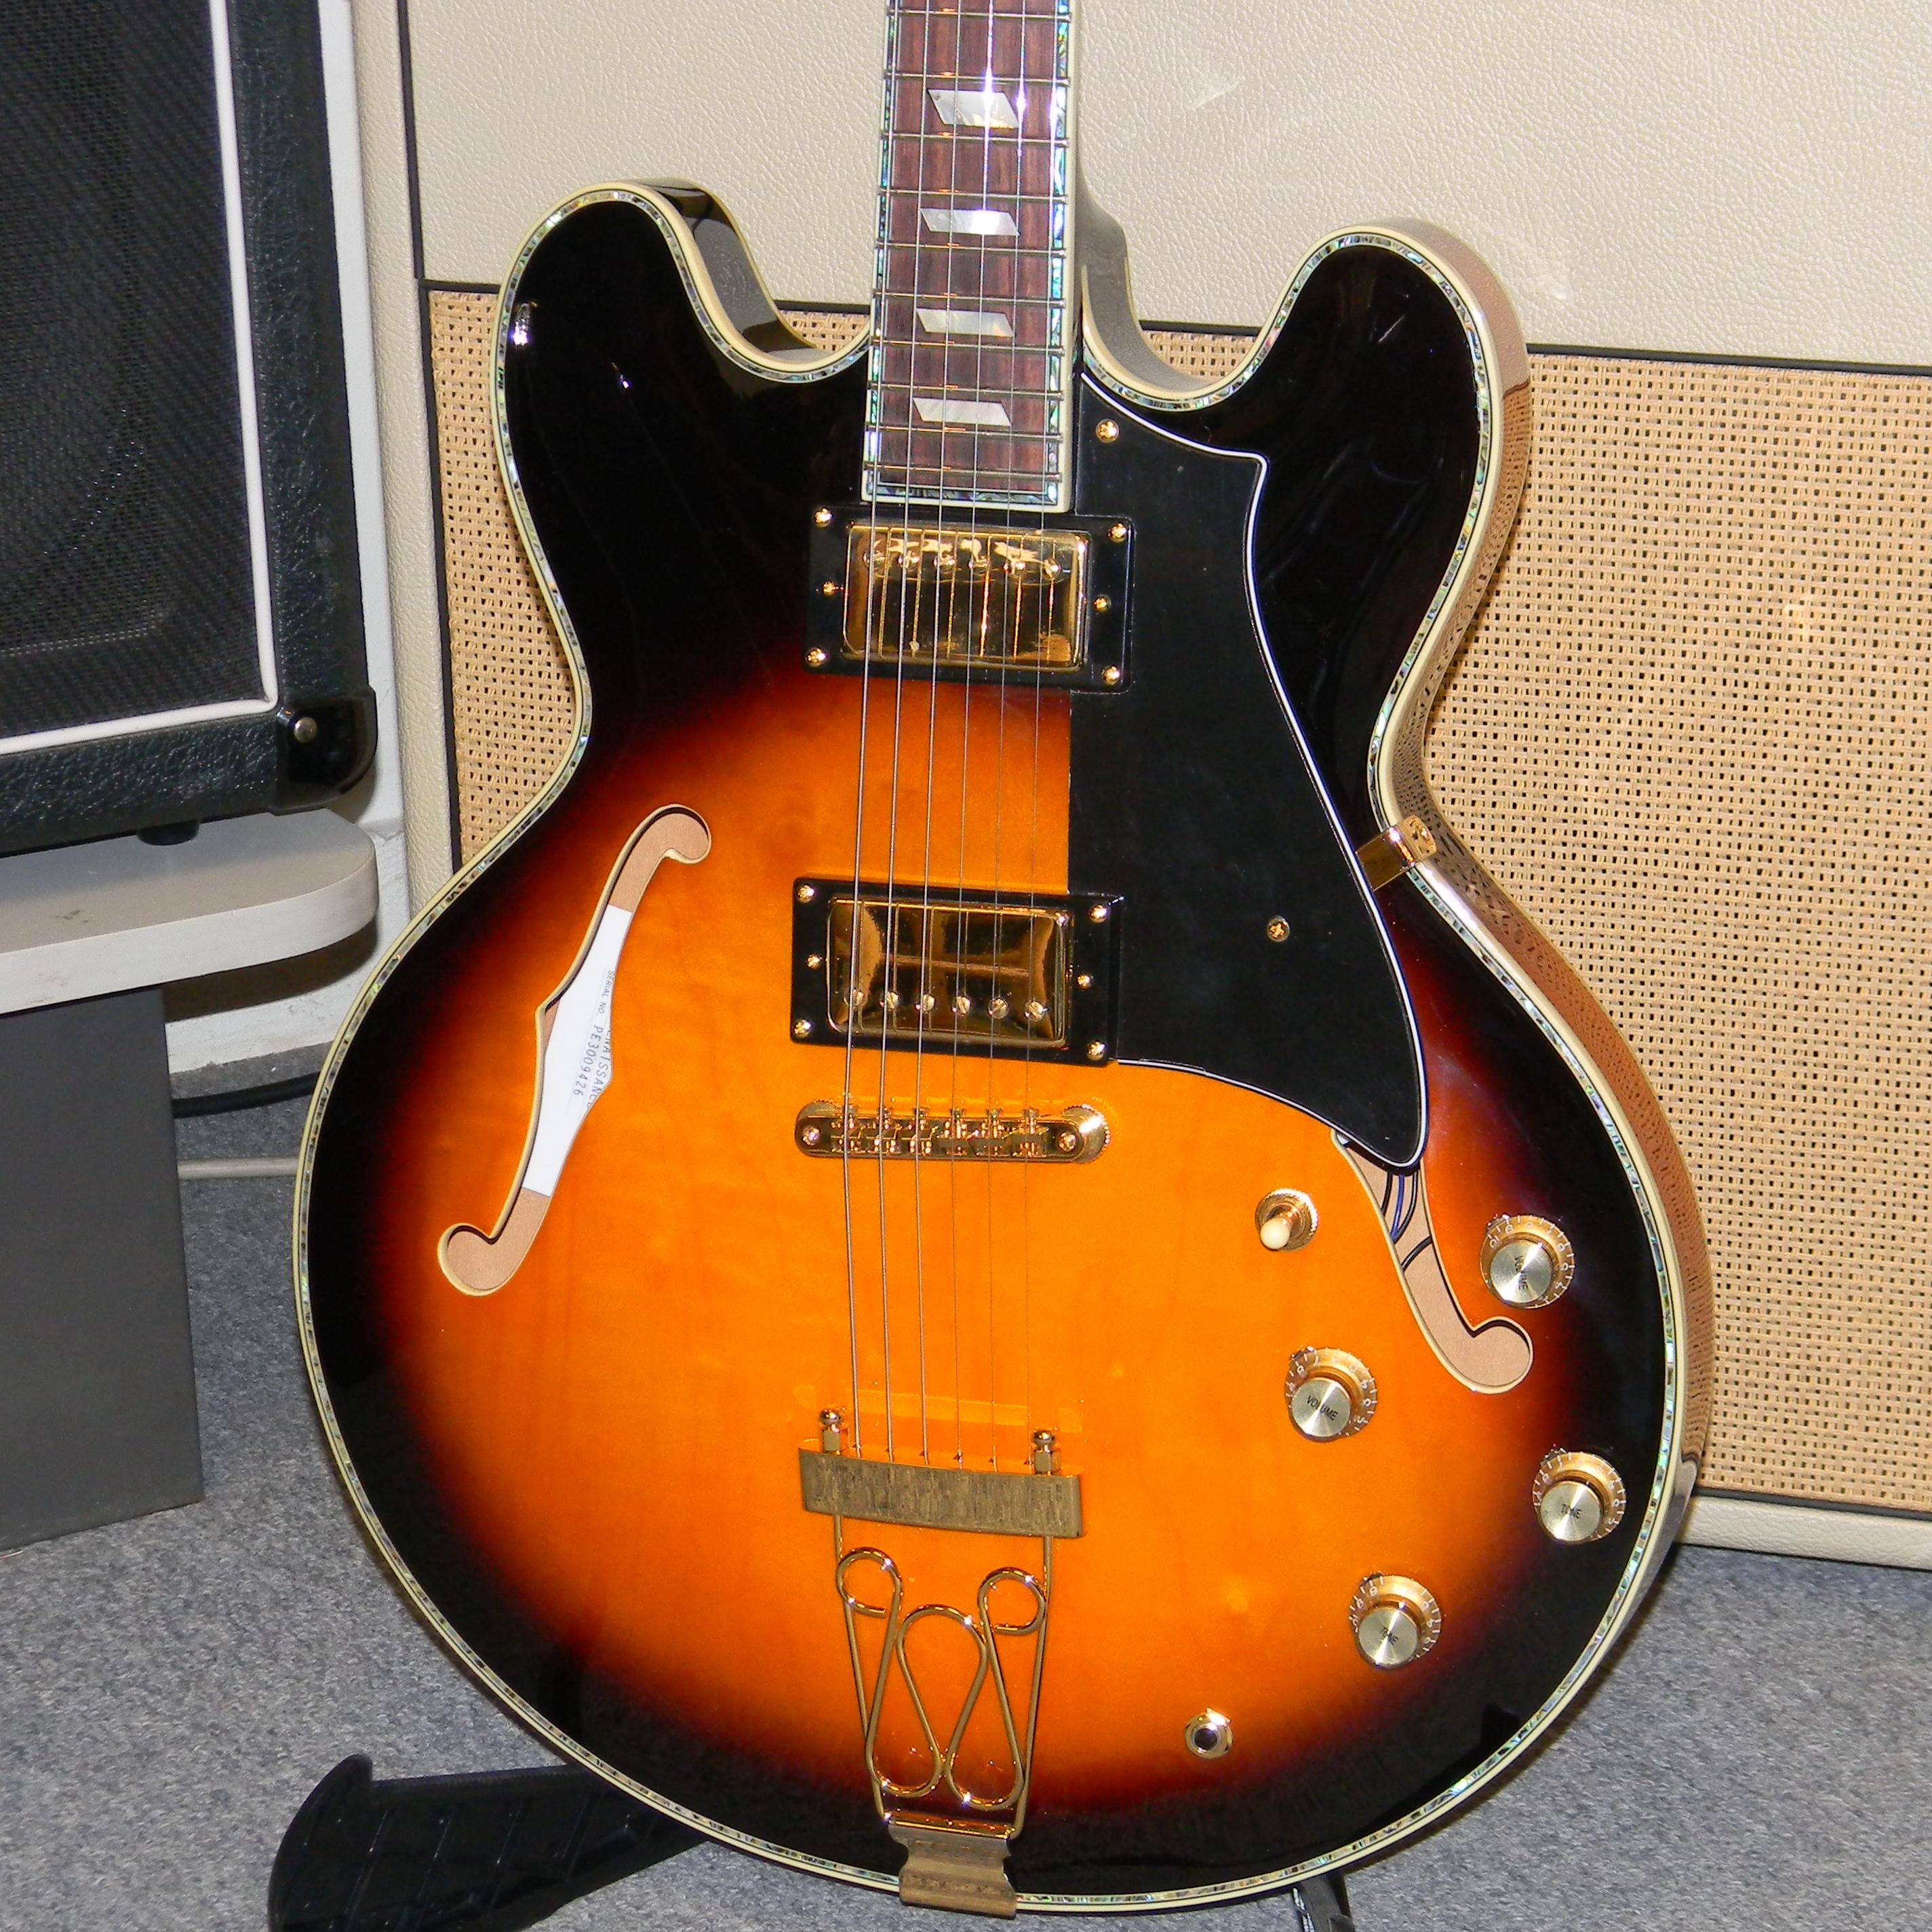 peerless march 2013 042 san antonio guitar store guitar tex. Black Bedroom Furniture Sets. Home Design Ideas